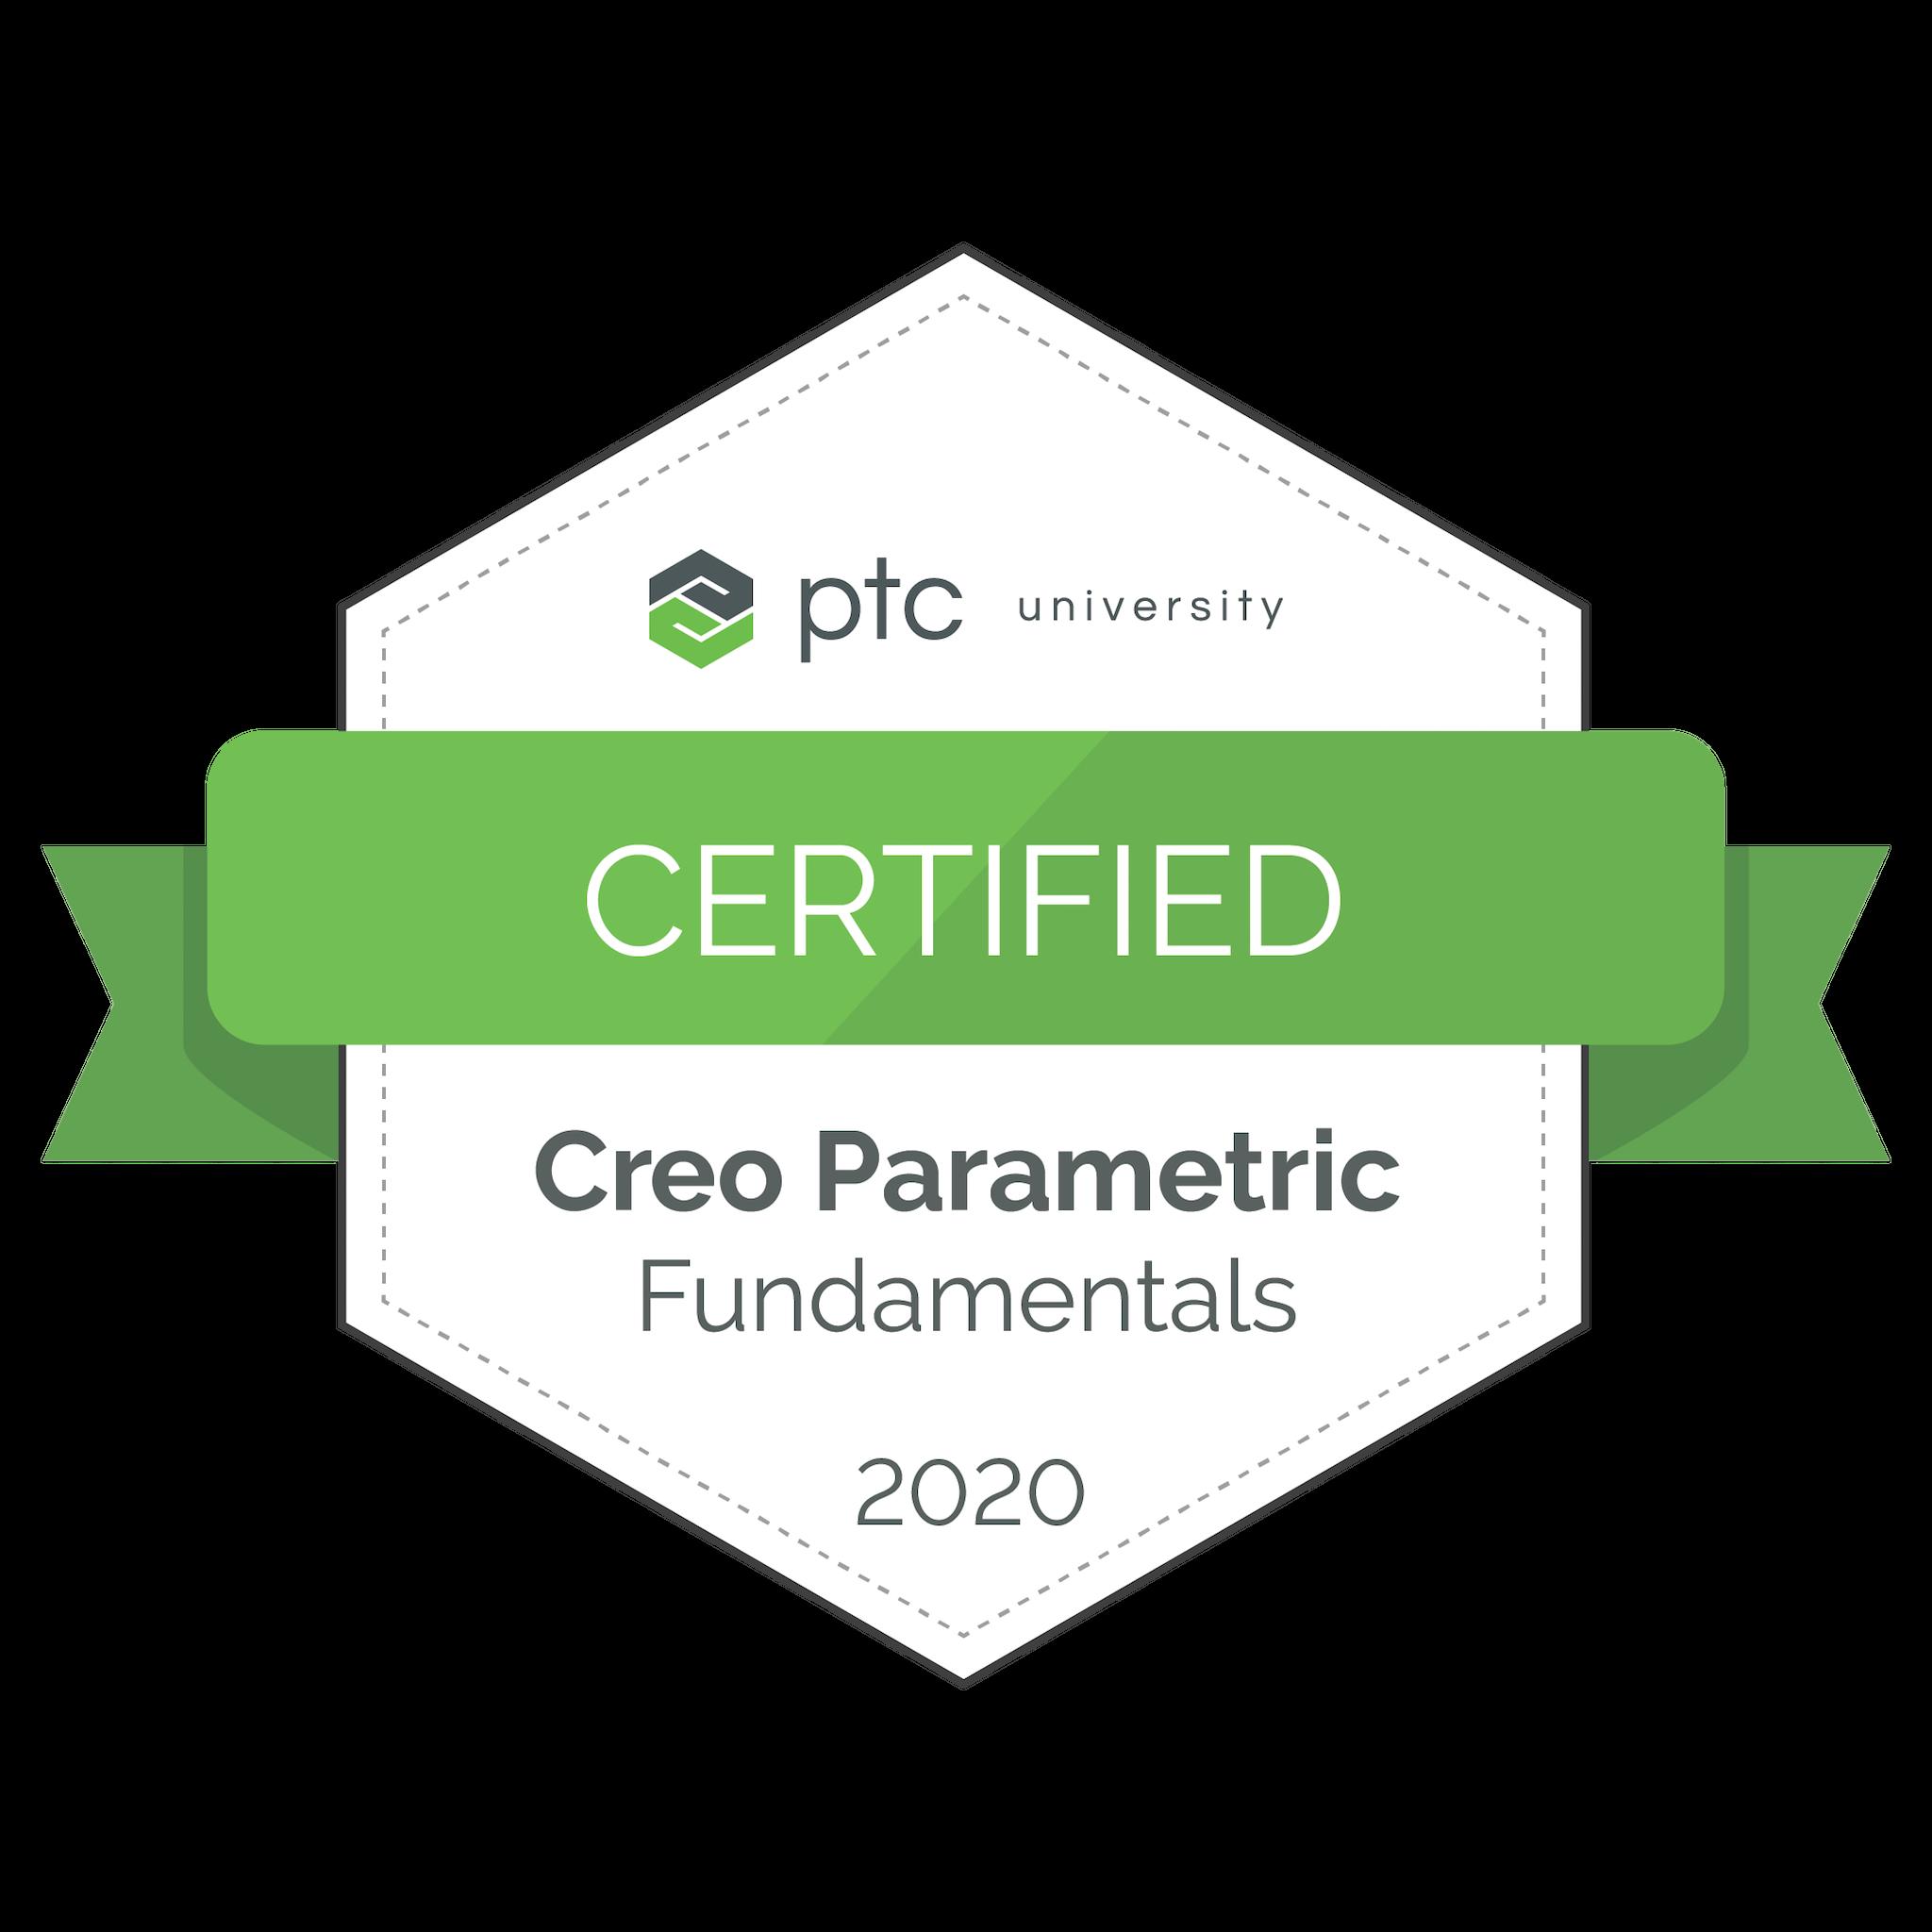 Creo Parametric Fundamentals Certification 2020